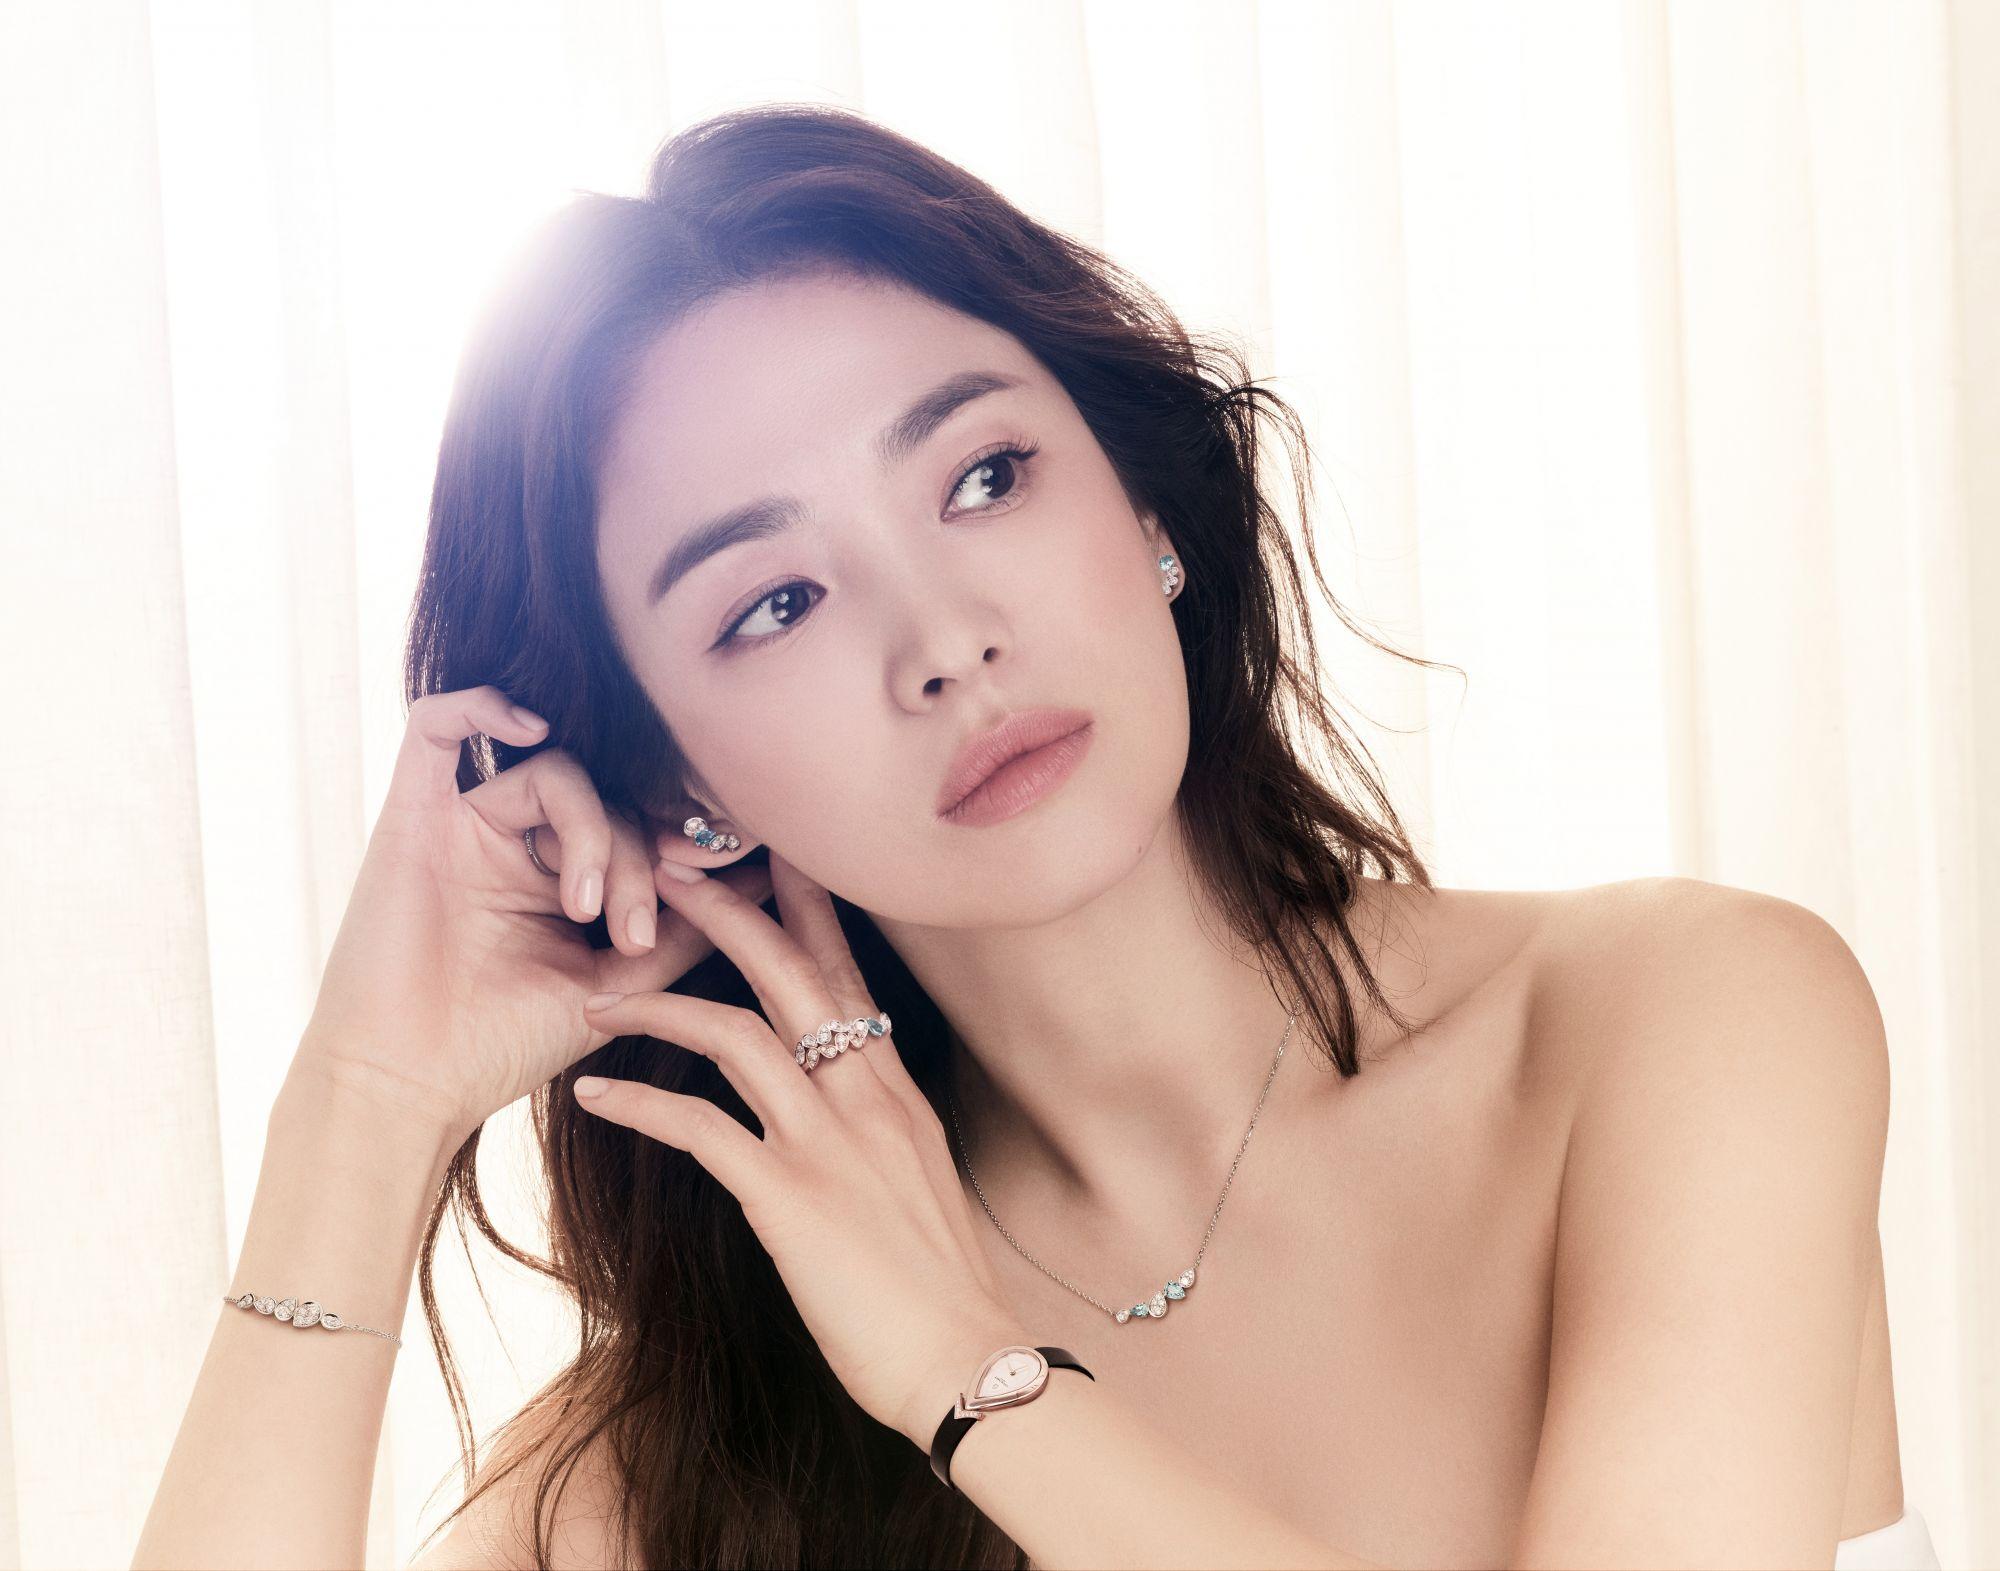 Song Hye Kyo Embodies The Fine Qualities Of Chaumet's Josephine Jewellery